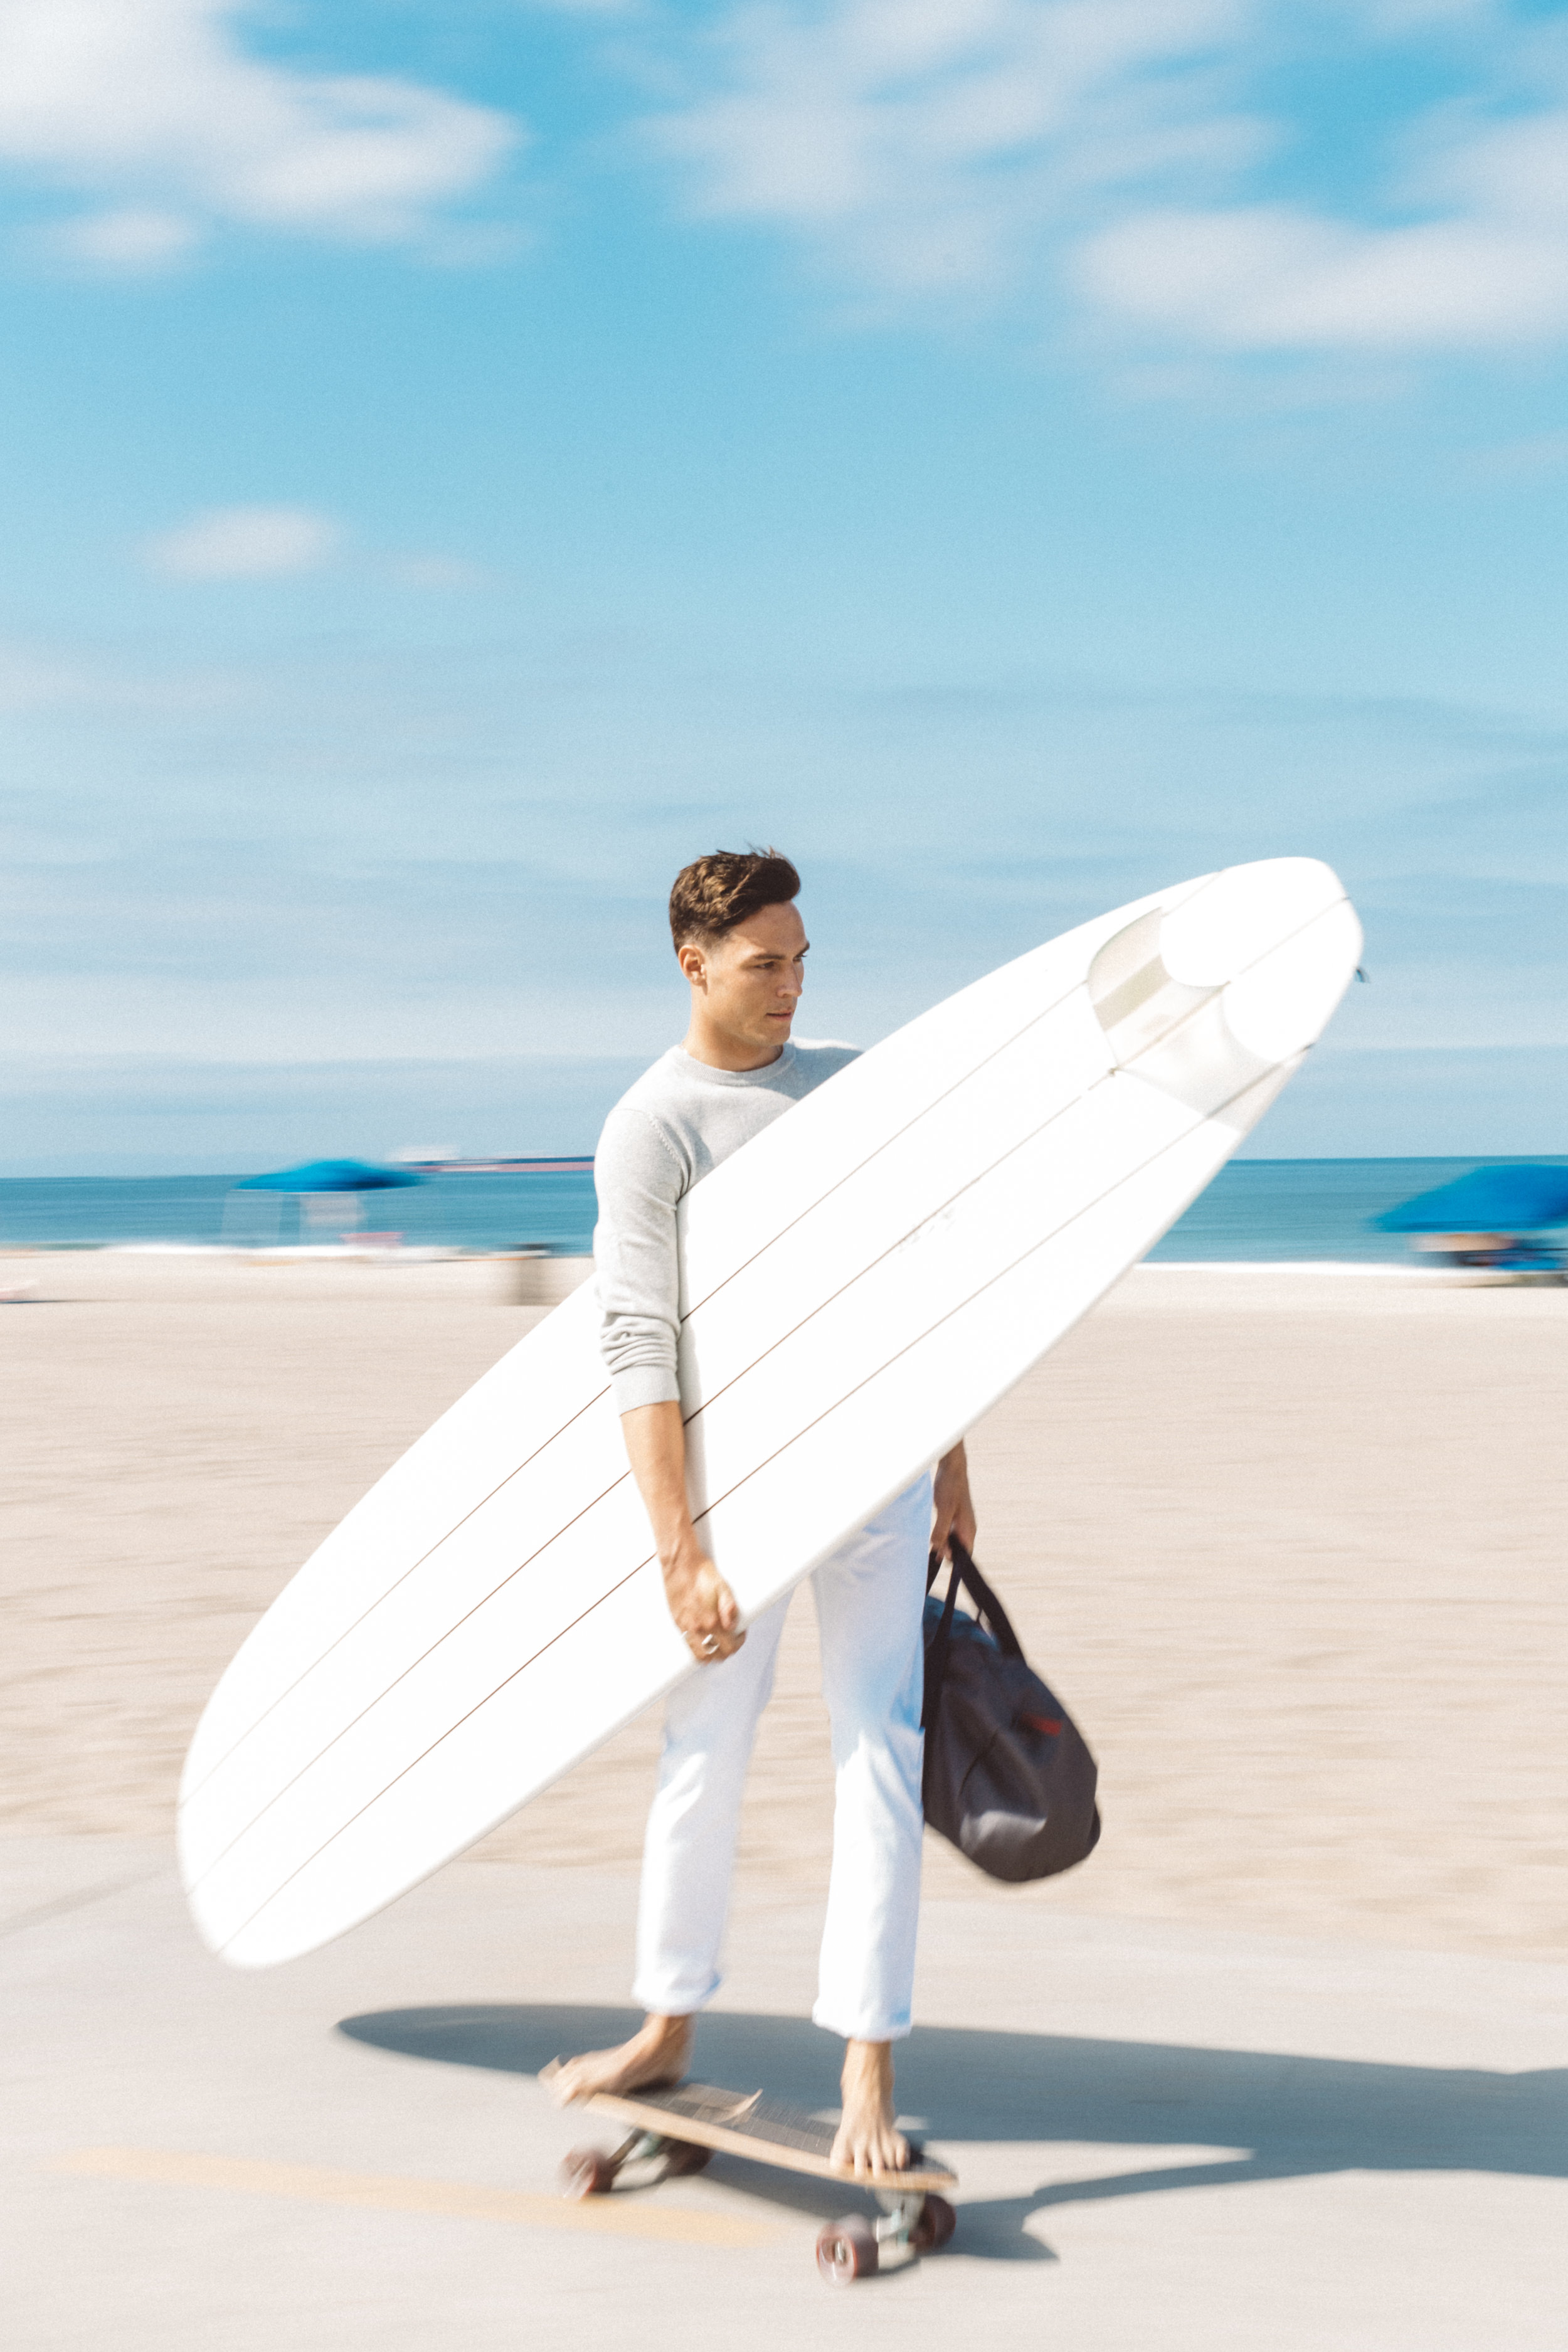 captainbarto-blog-adambartoshesky-model-viviankim-photo-nautica-losangeles-california-summer-2018--11.jpg